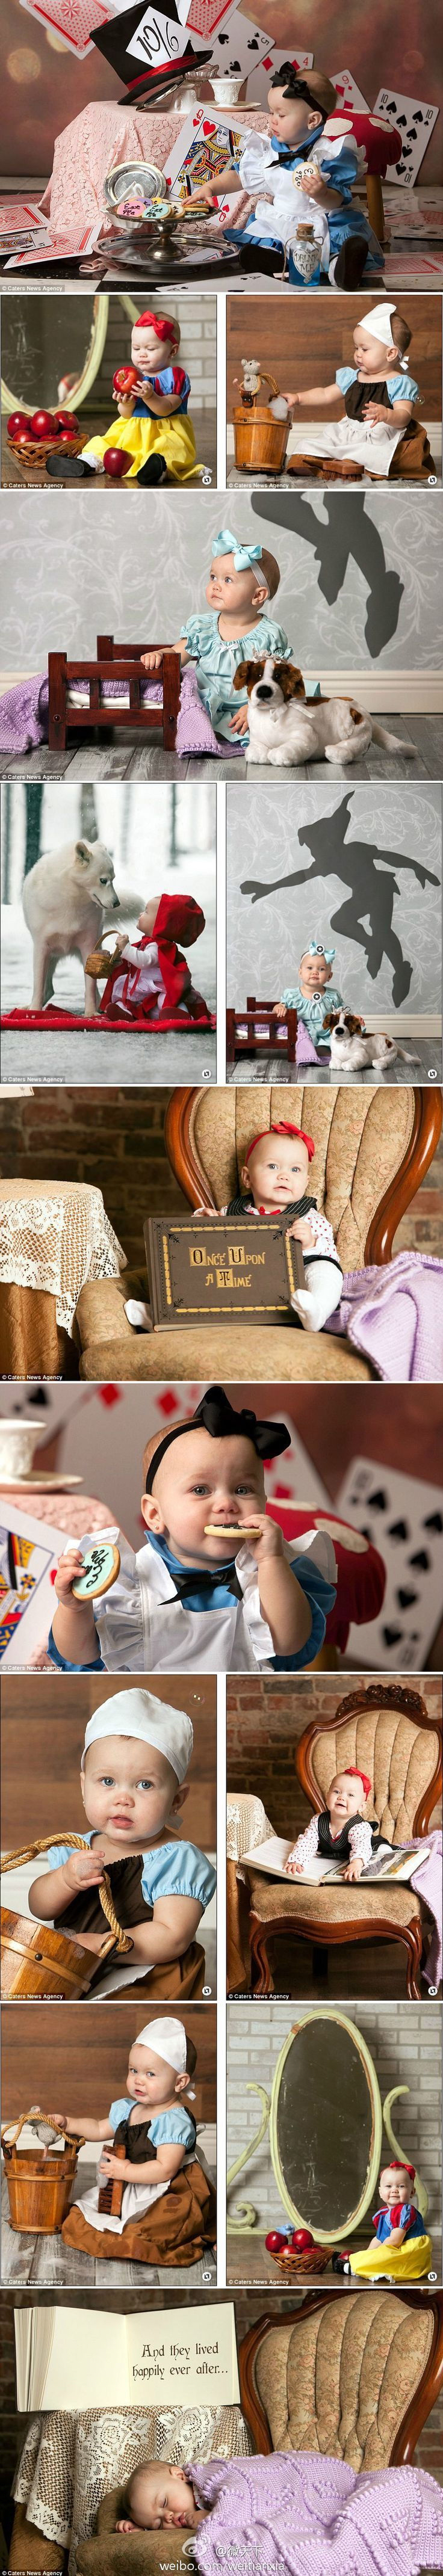 best little wonders images on pinterest newborns baby photos